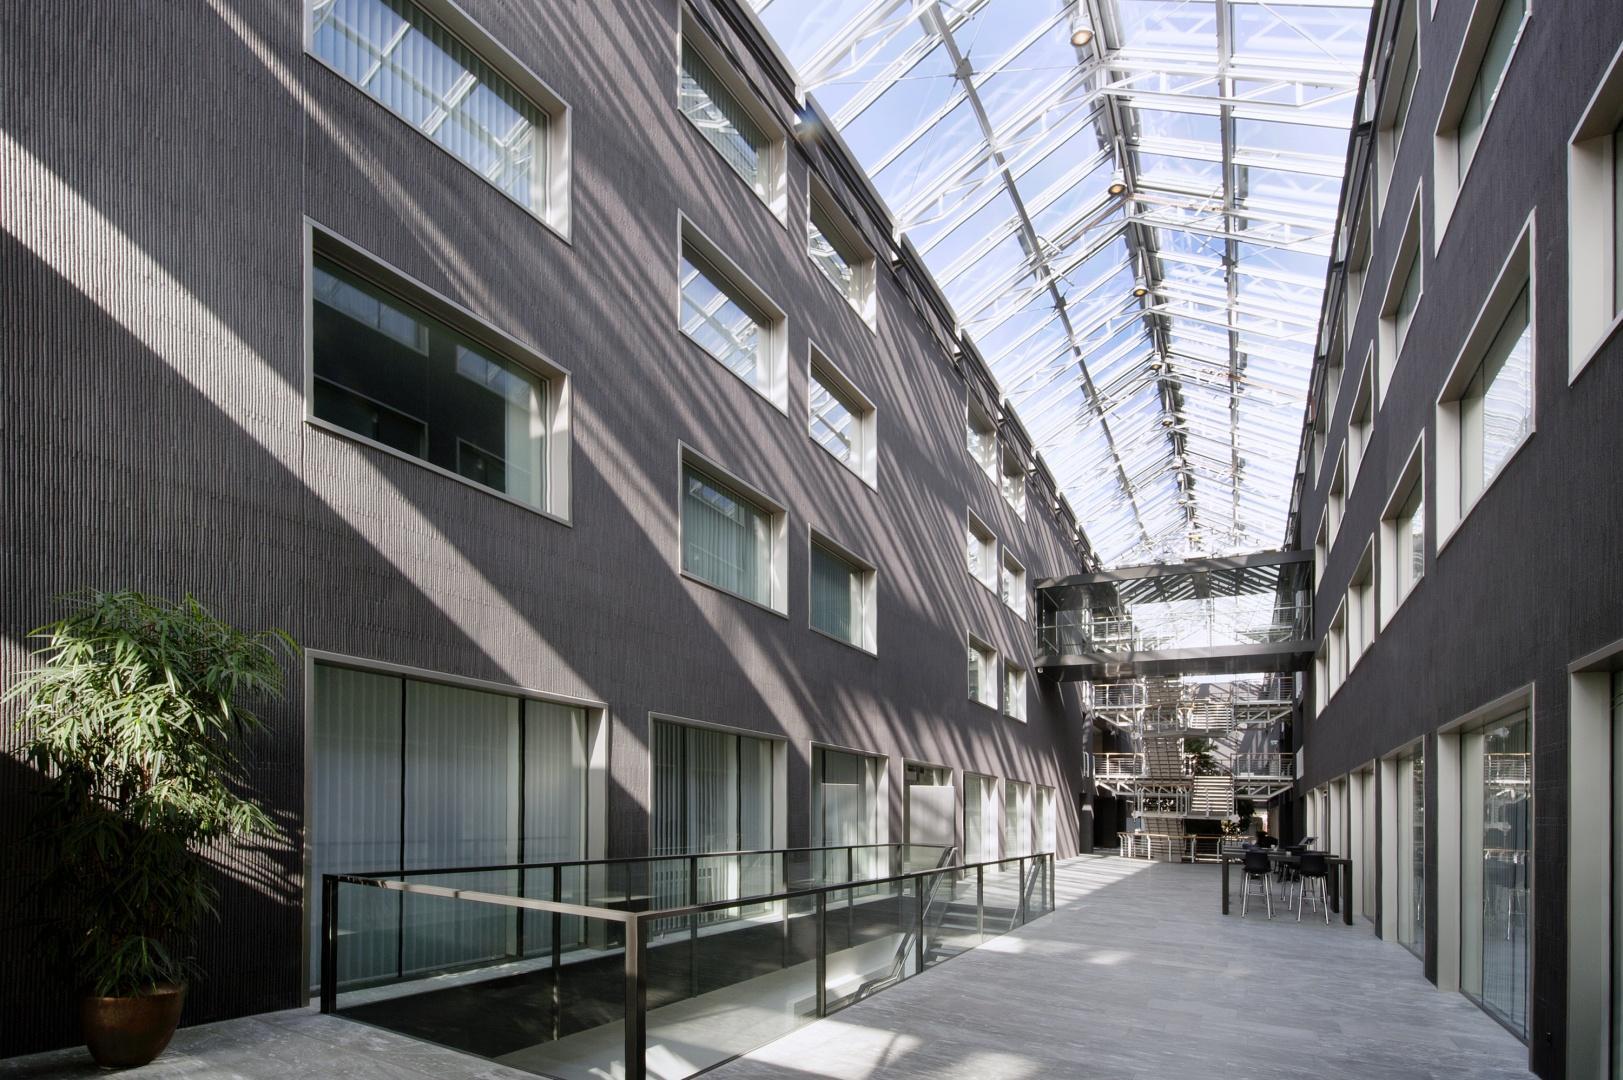 Innere Halle © Schulthess Klinik